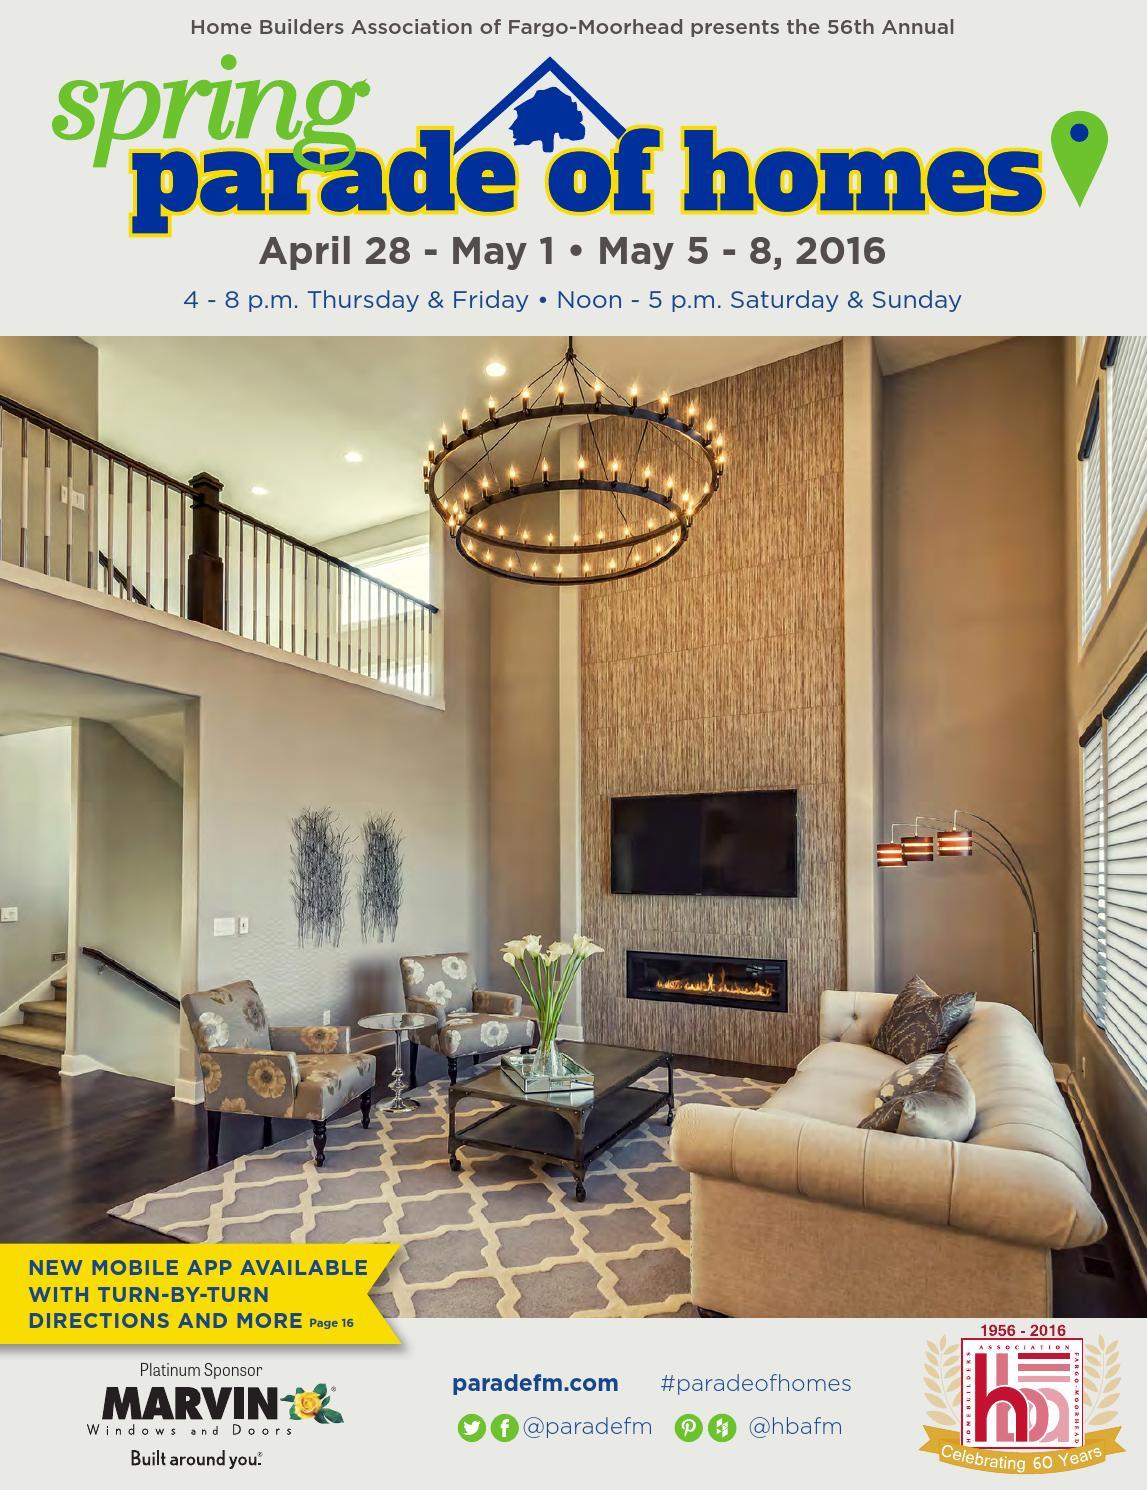 Spring showcase of new homes by gannett wisconsin media   issuu